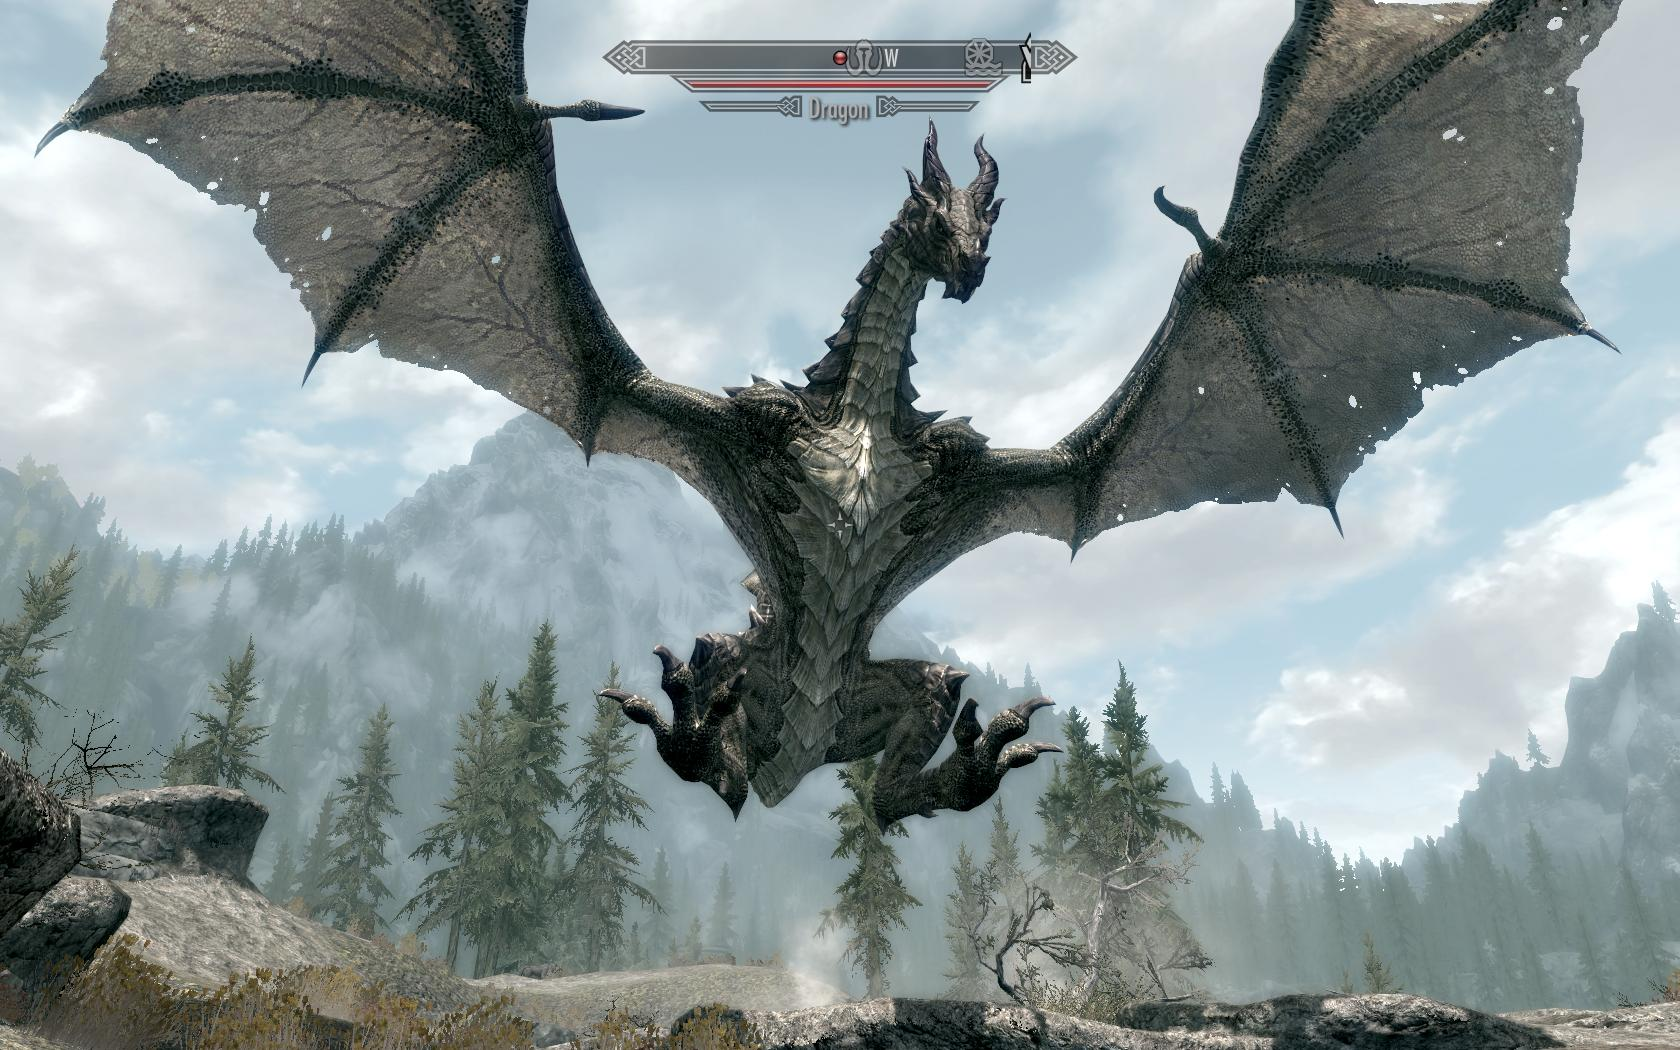 Skyrim Dragon: Skyrim-dragon By Jd1680a On DeviantArt